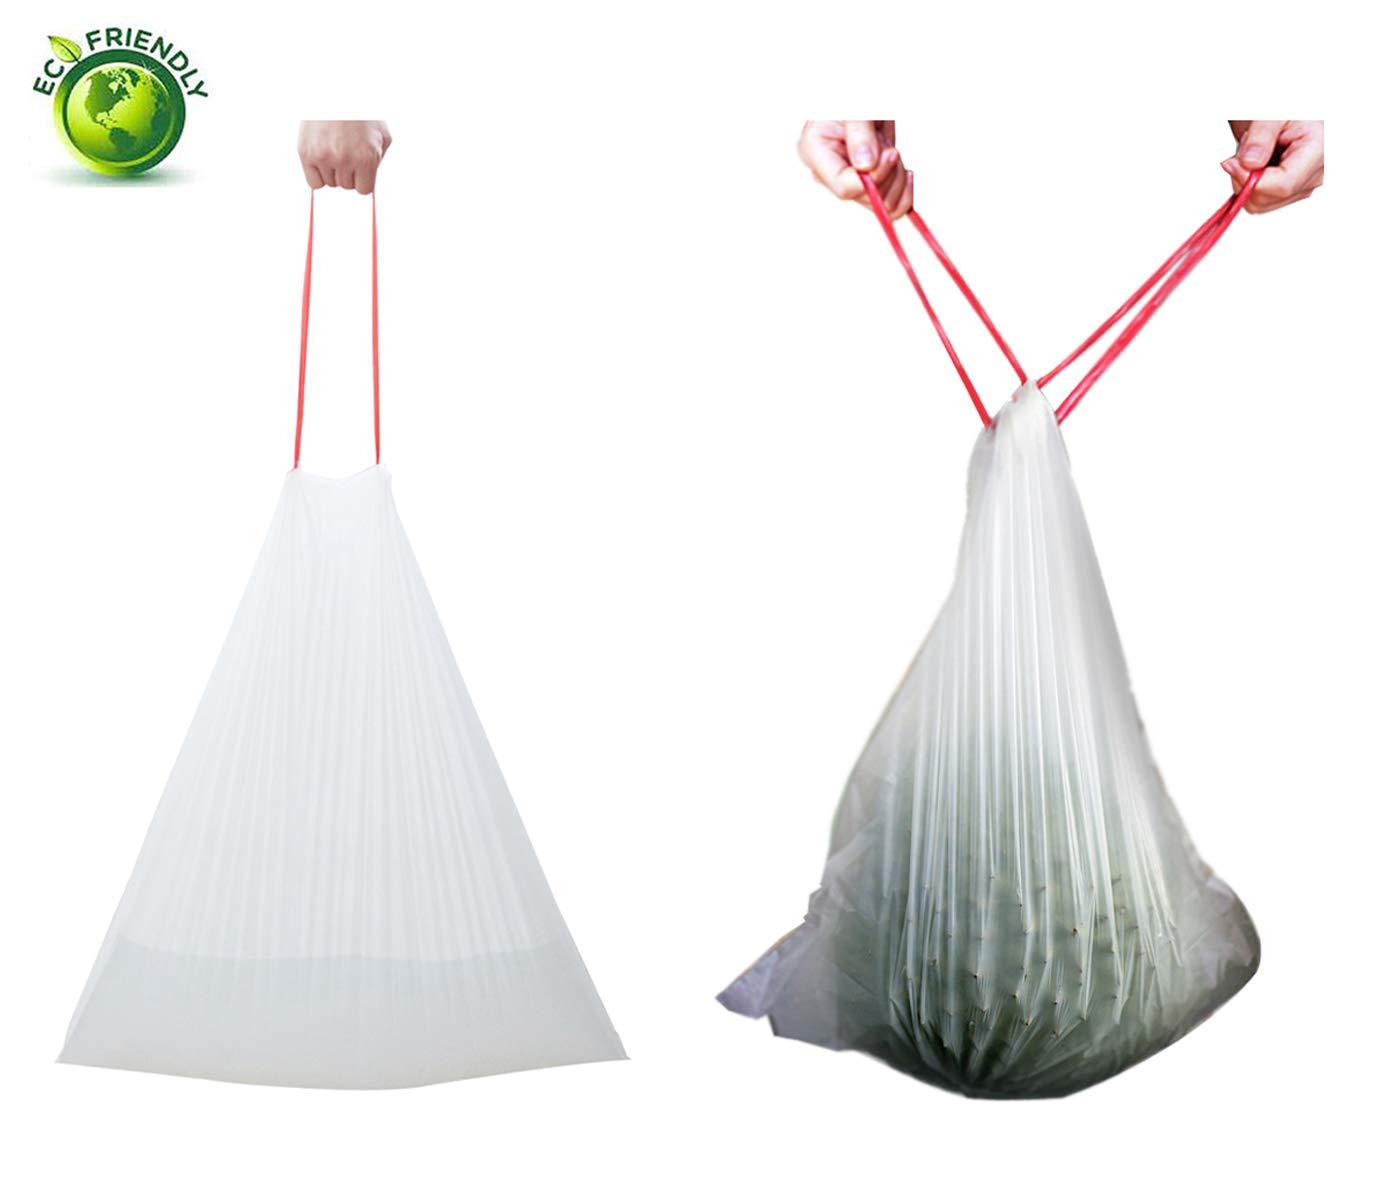 8 Gallon, 13 Gallon,30 Gallon 8 Gallon Drawstring Trash Bags,13 Gallon Trash Bags,8 Gallon Trash Bags and 30 Gallon Trash Bags,Kitchen Trash Bags,Used for House,Office,Hotel,Outdoor,High Tenacity